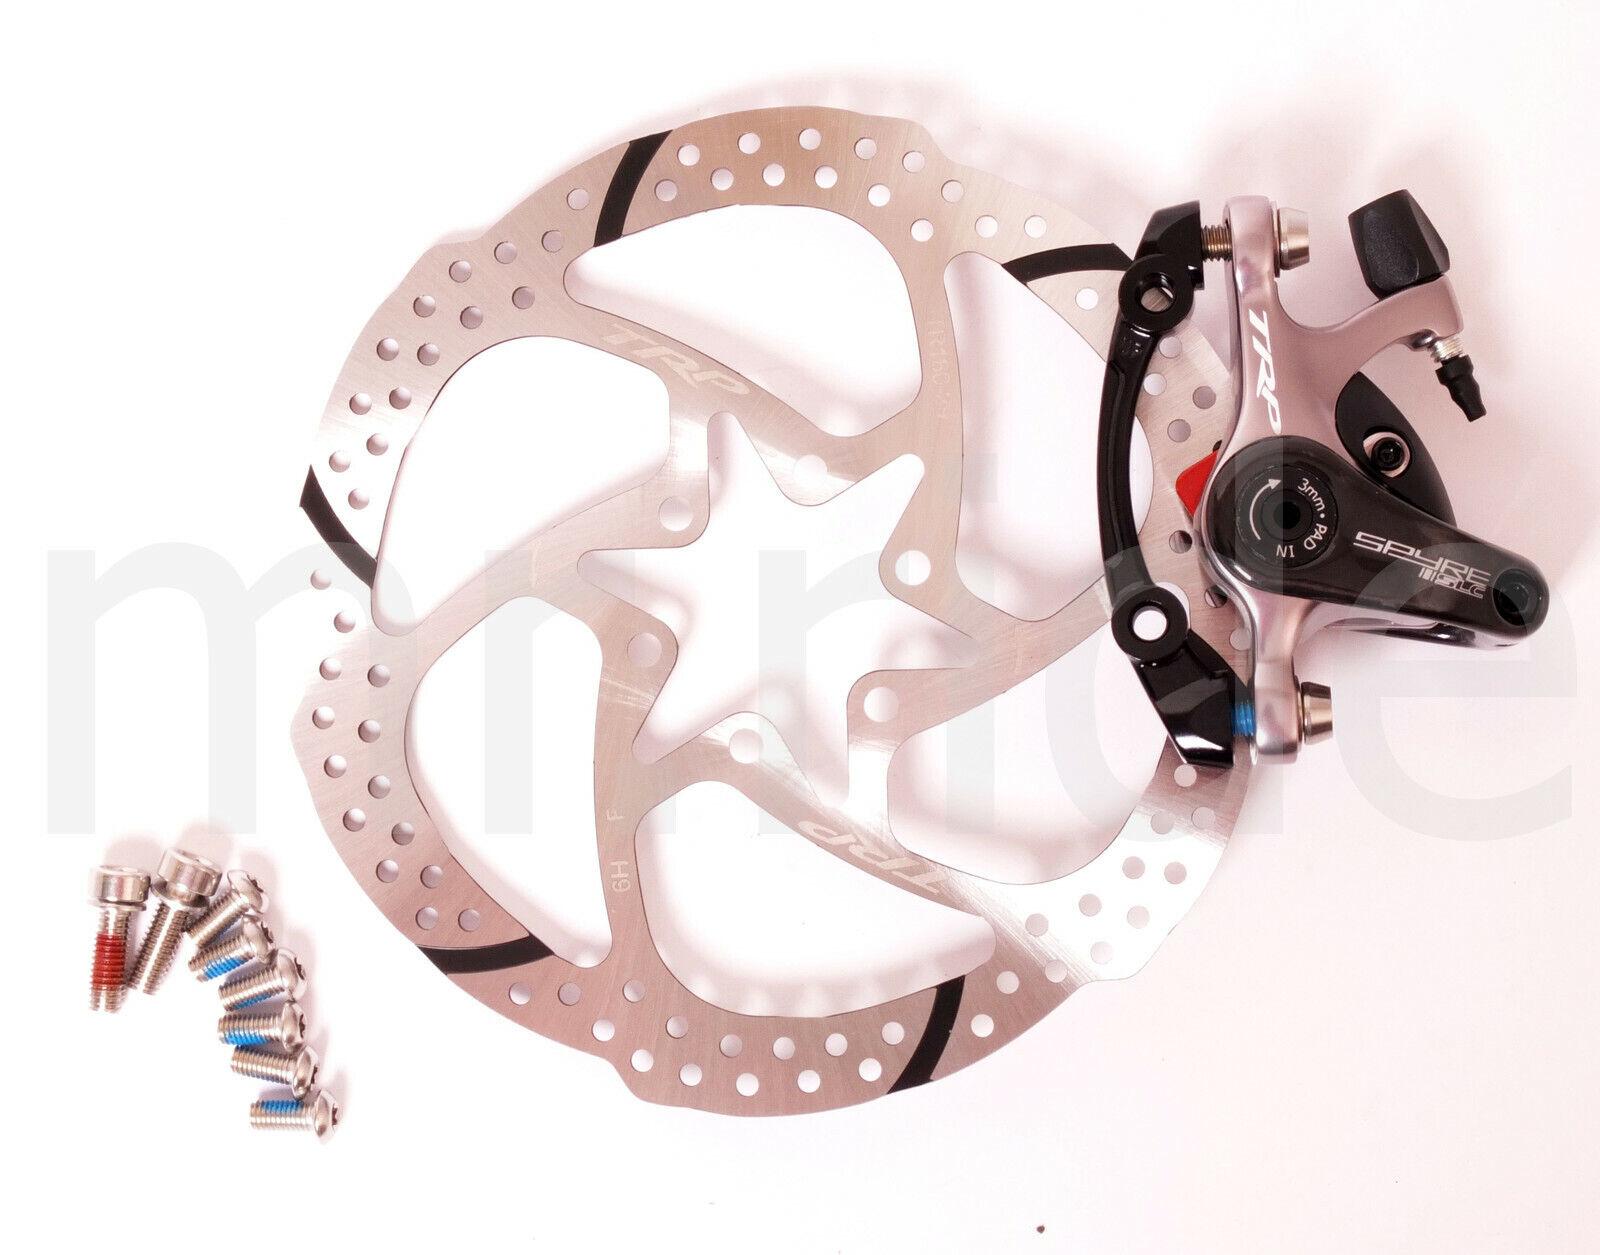 TRP SPYRE SLC autoBONIO azionamento braccio Mechancial stradaCX 160 mm Freno A Disco rossoore